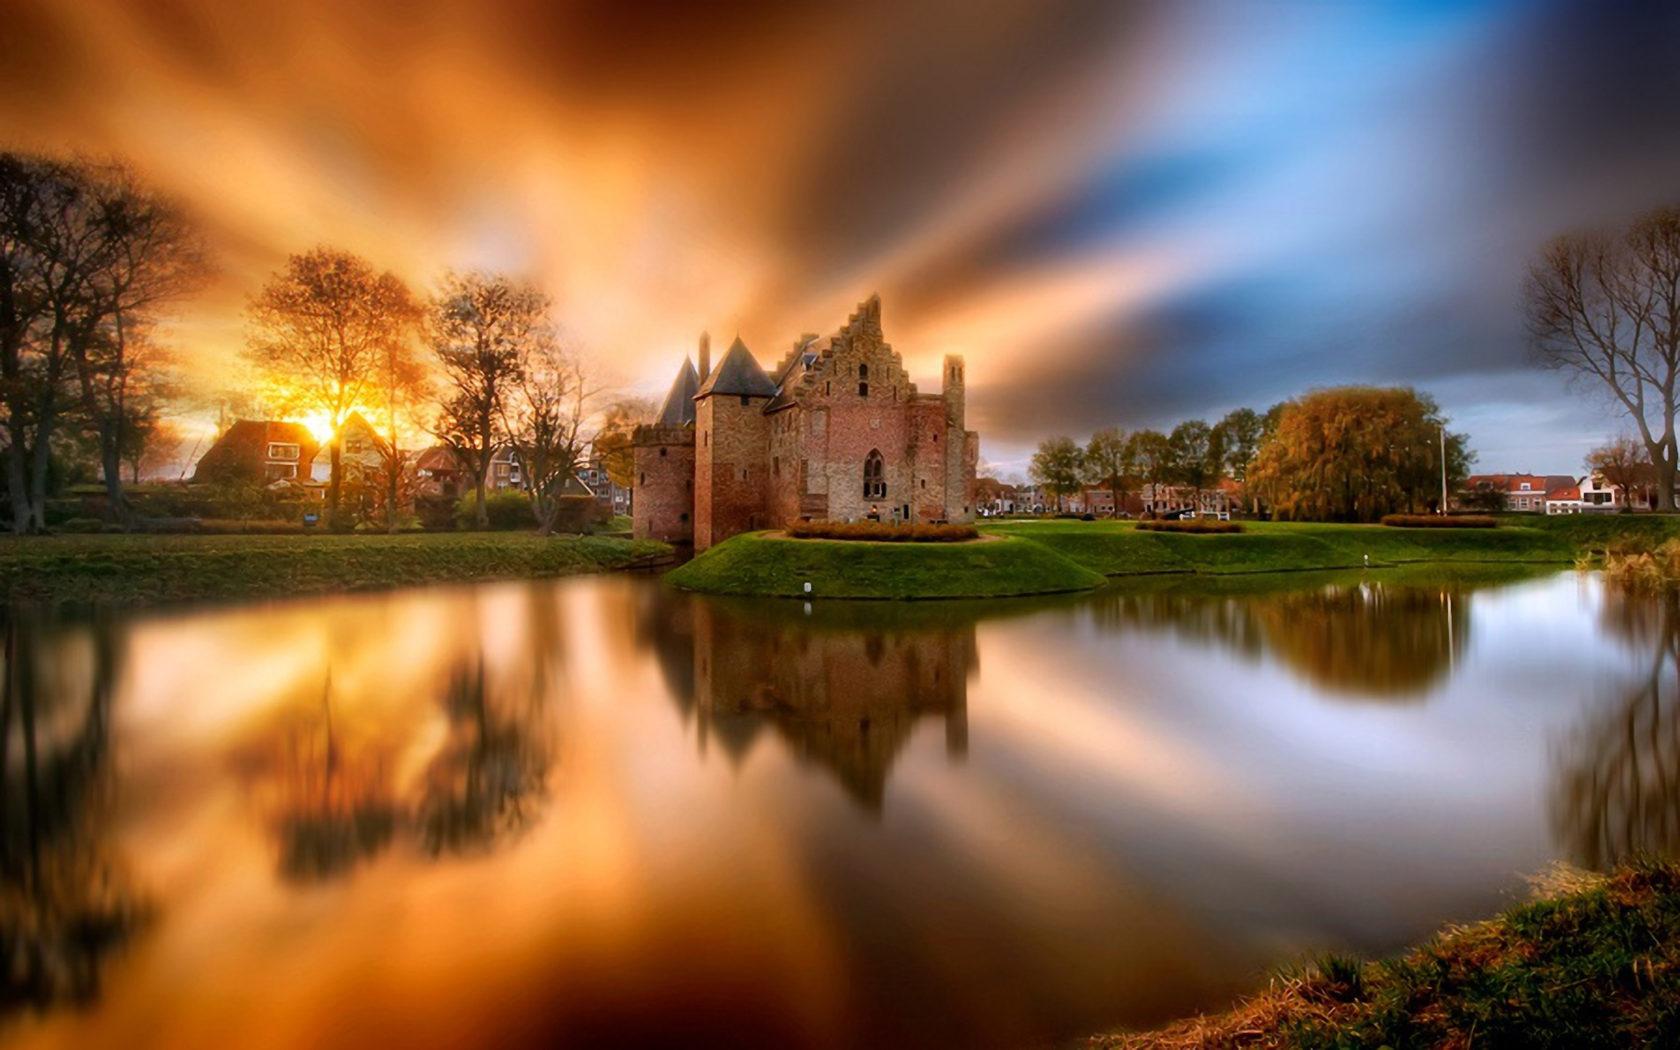 Ocean Iphone Wallpaper Hd Castle Lake Sunset Netherlands Hd Wallpaper Wallpapers13 Com